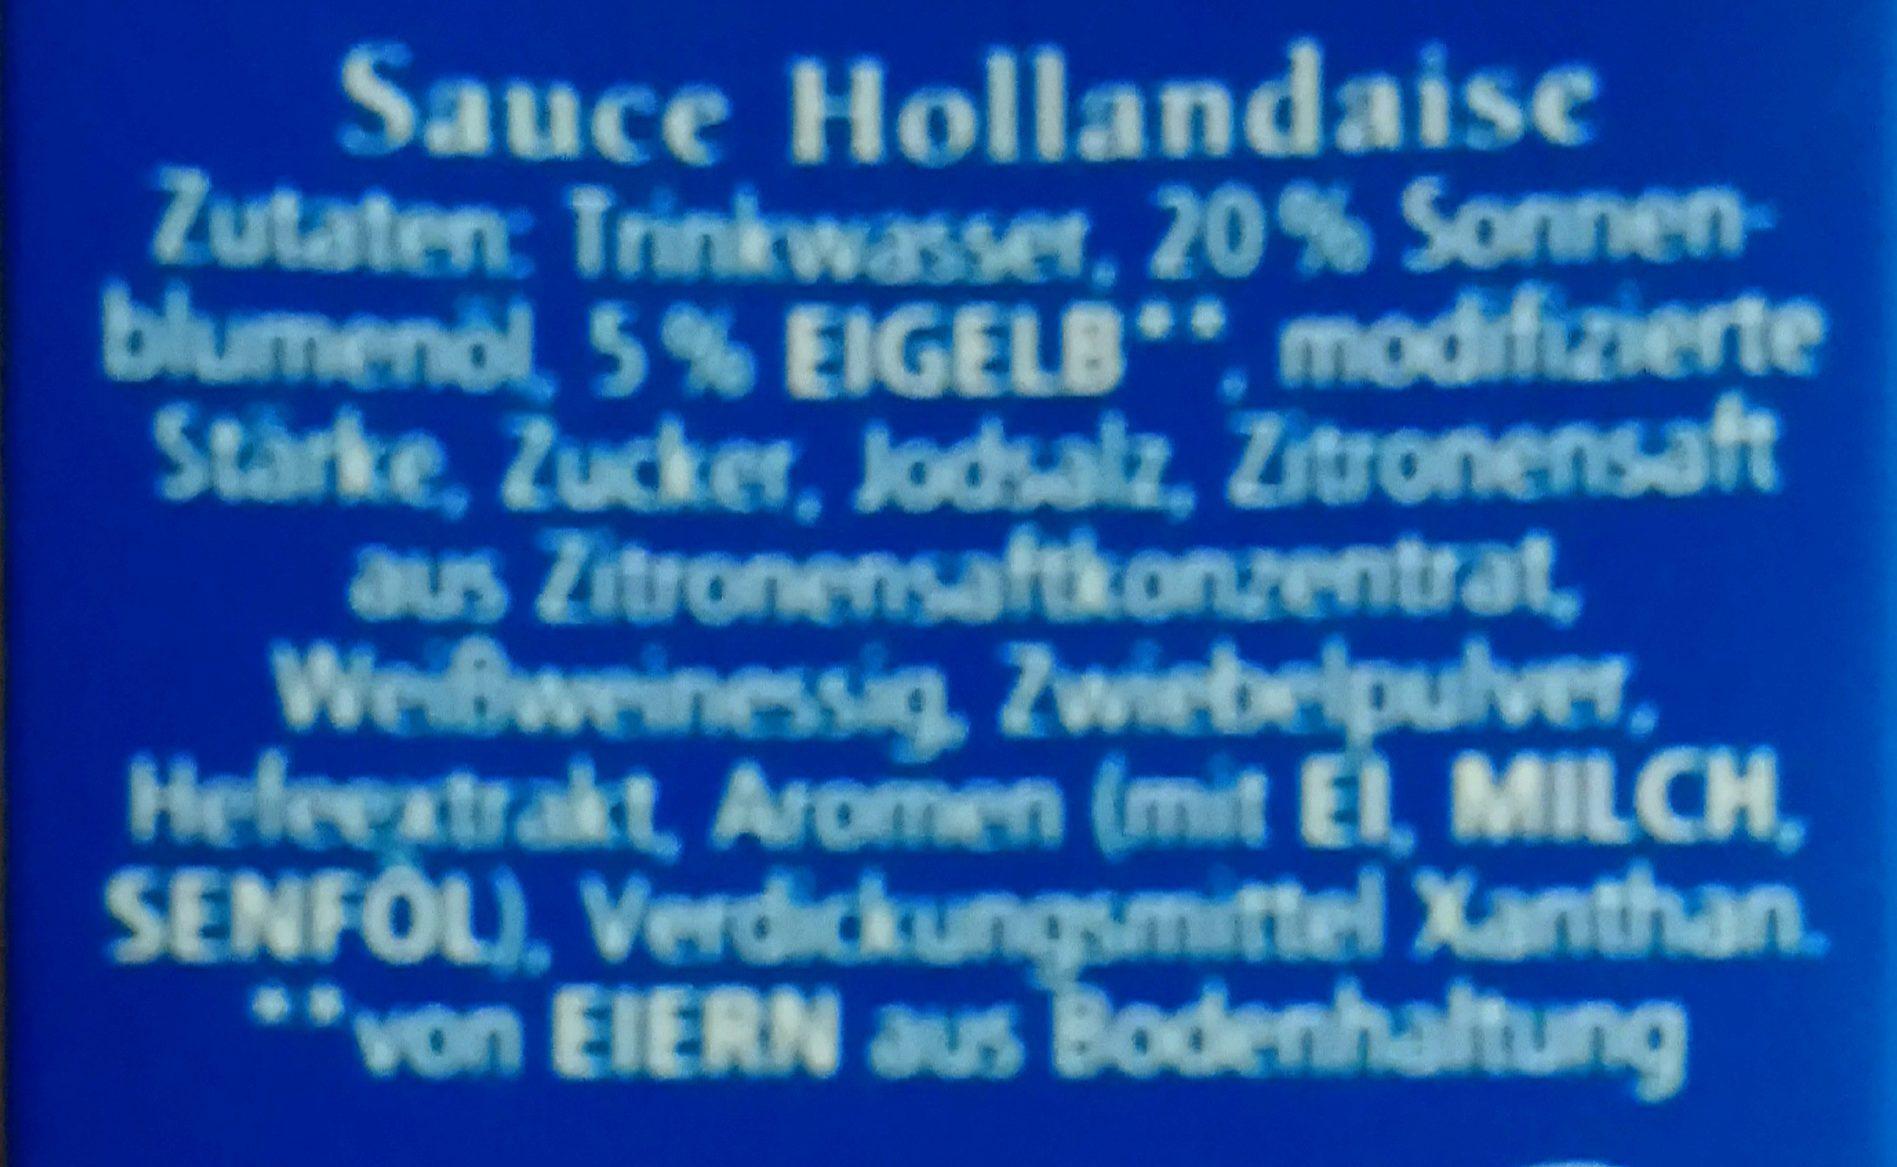 Hollandaise - Ingredients